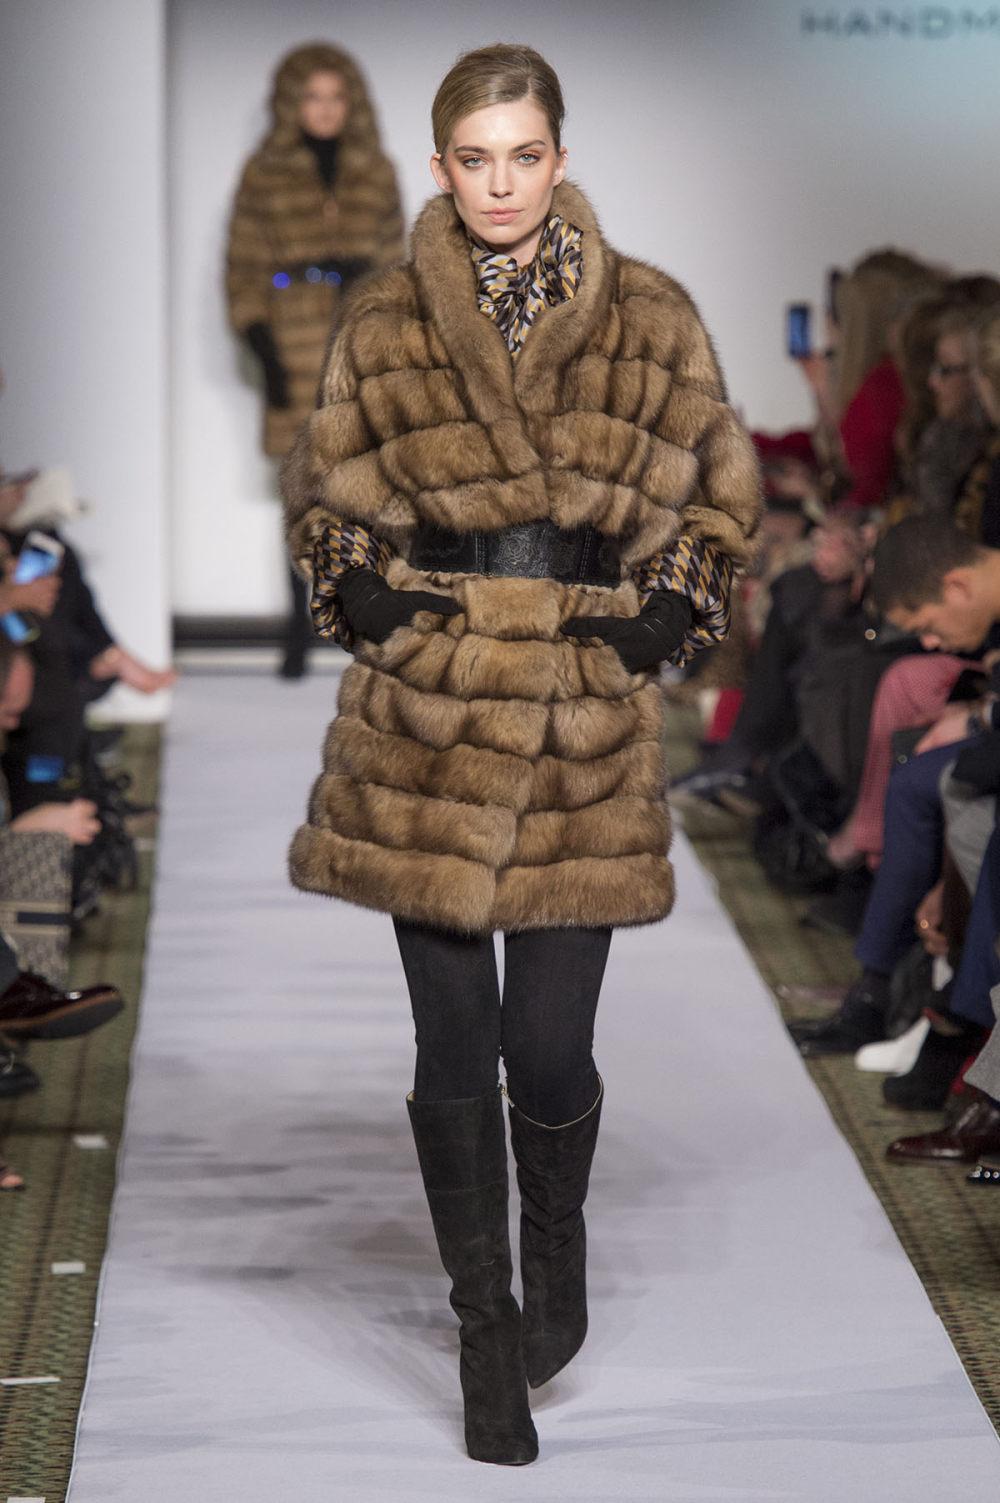 Carolina Herrera时装系列用鲜艳的颜色充满智能的黑白色调-10.jpg